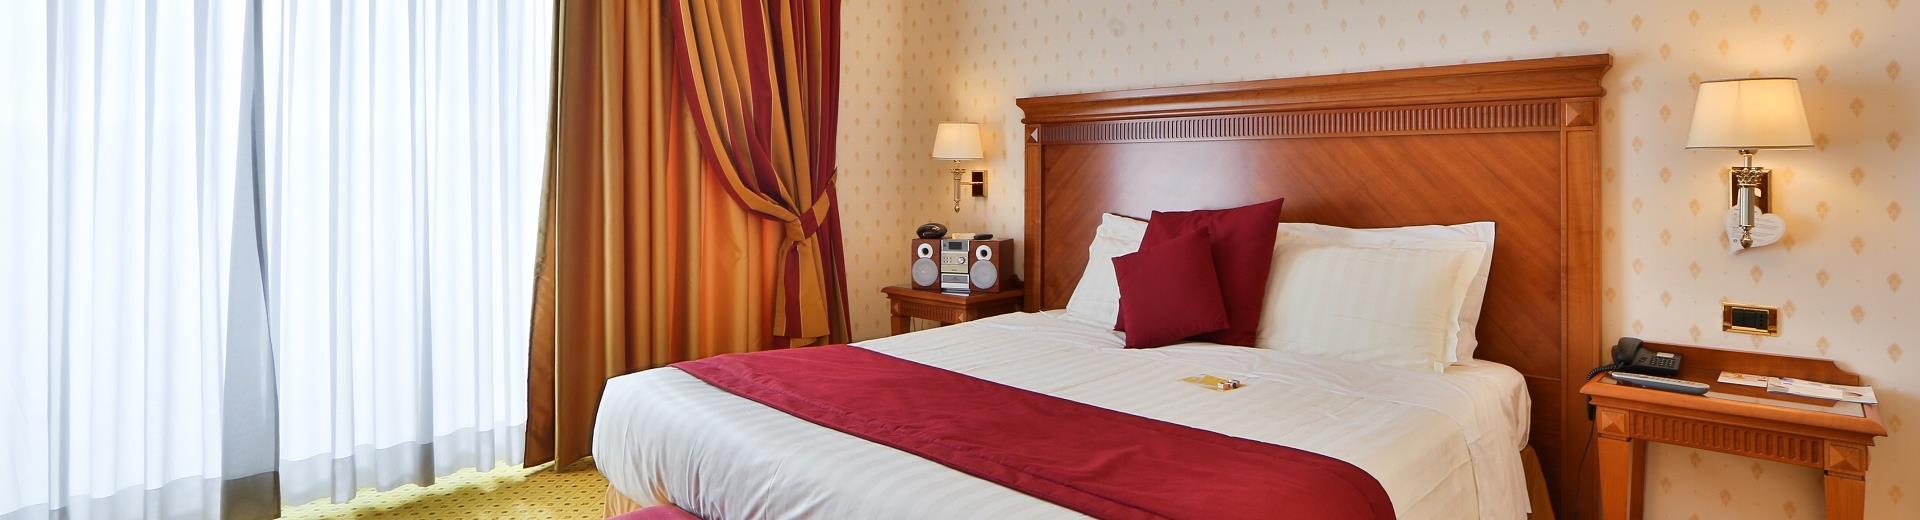 Rooms Hotel Viterbo Bw Hotel Viterbo Rooms 4 Star Hotel